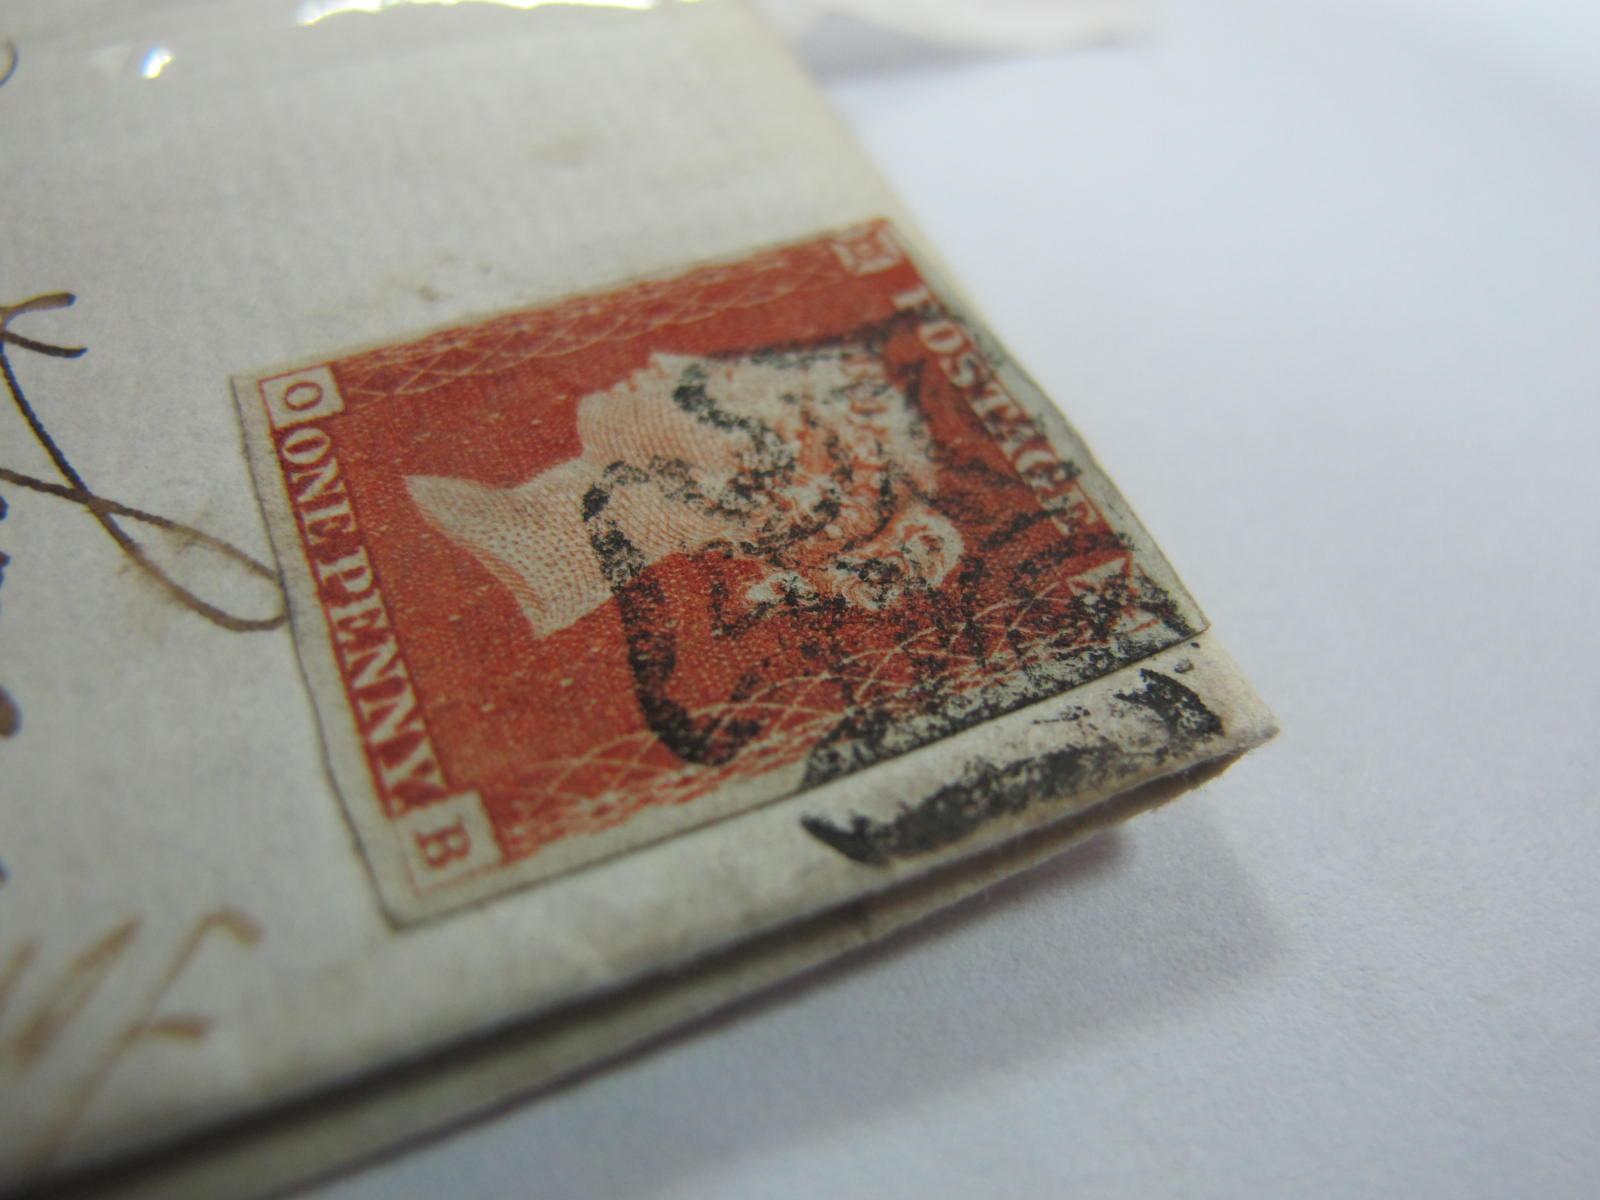 1841 1d Red 4 Margin 0 - 13, Perth MX cover, cat £700. - Image 4 of 4